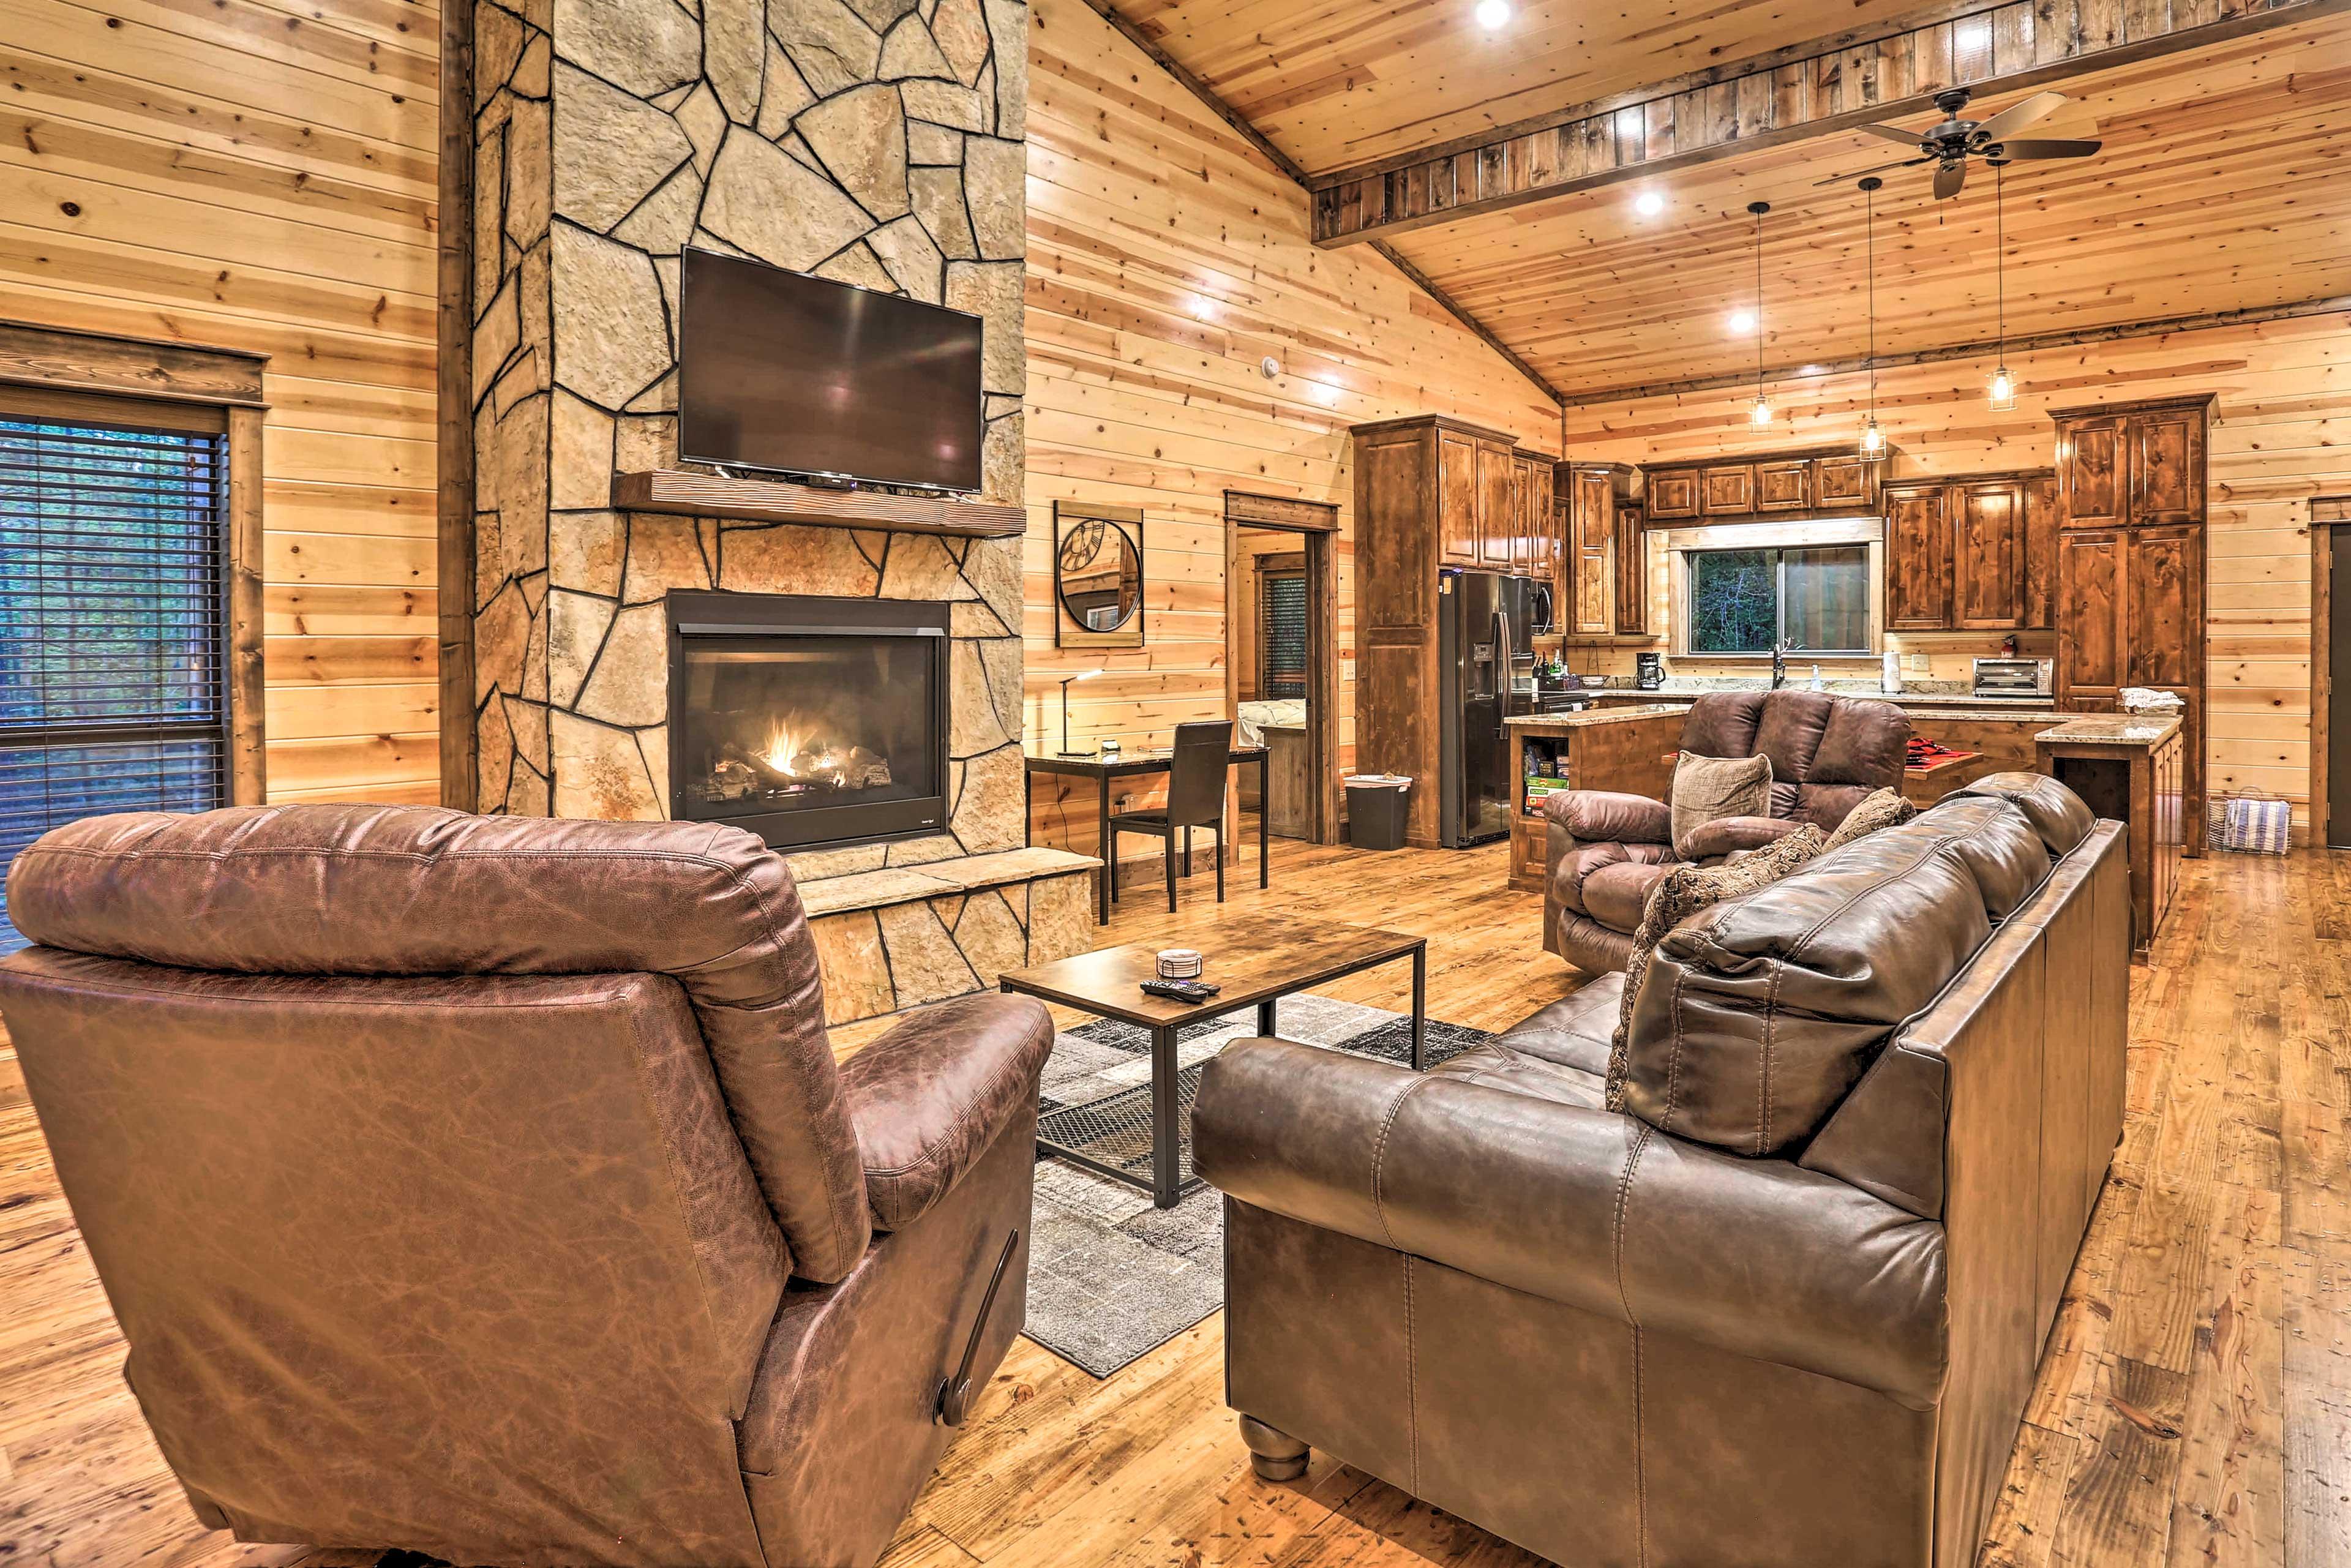 Living Room | Gas Fireplace | TV | Rustic Furnishings